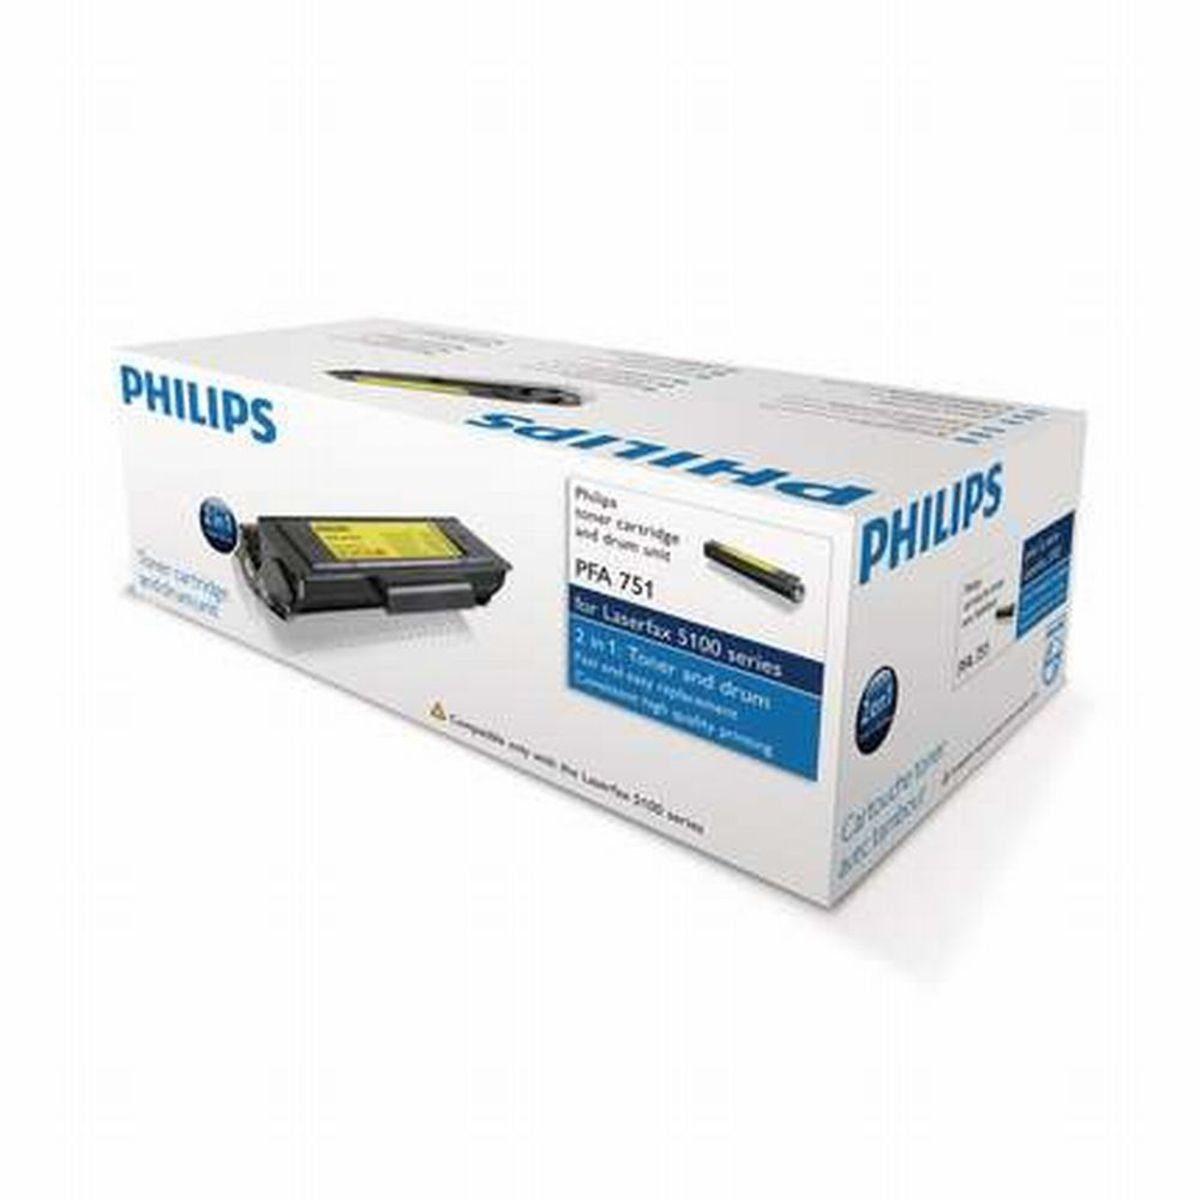 Philips Toner »PFA 751 Toner«